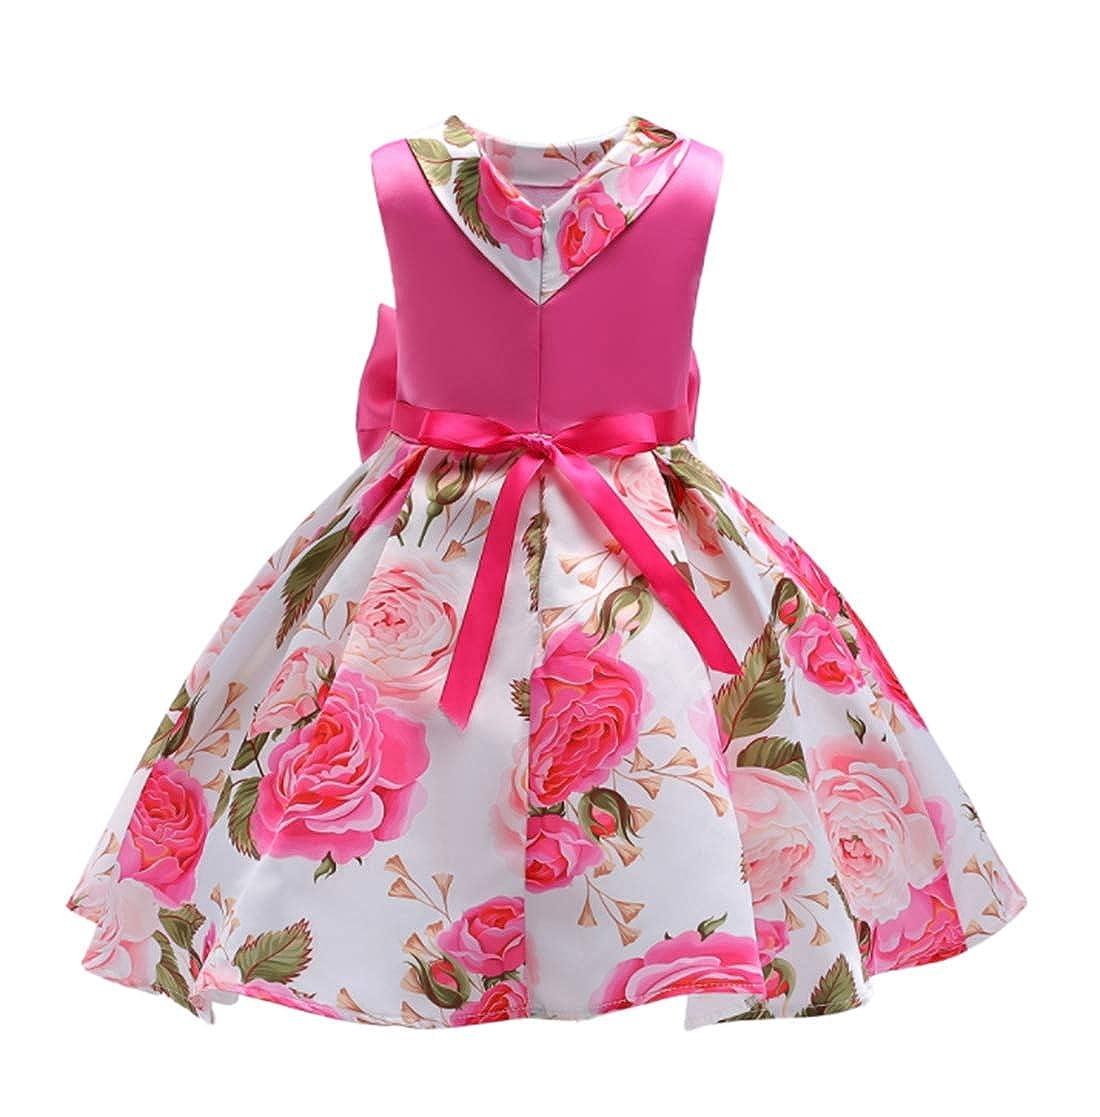 ADHS Girl Dresses for Girls Kids Flower Tutu Holiday Wedding Princess Dresses